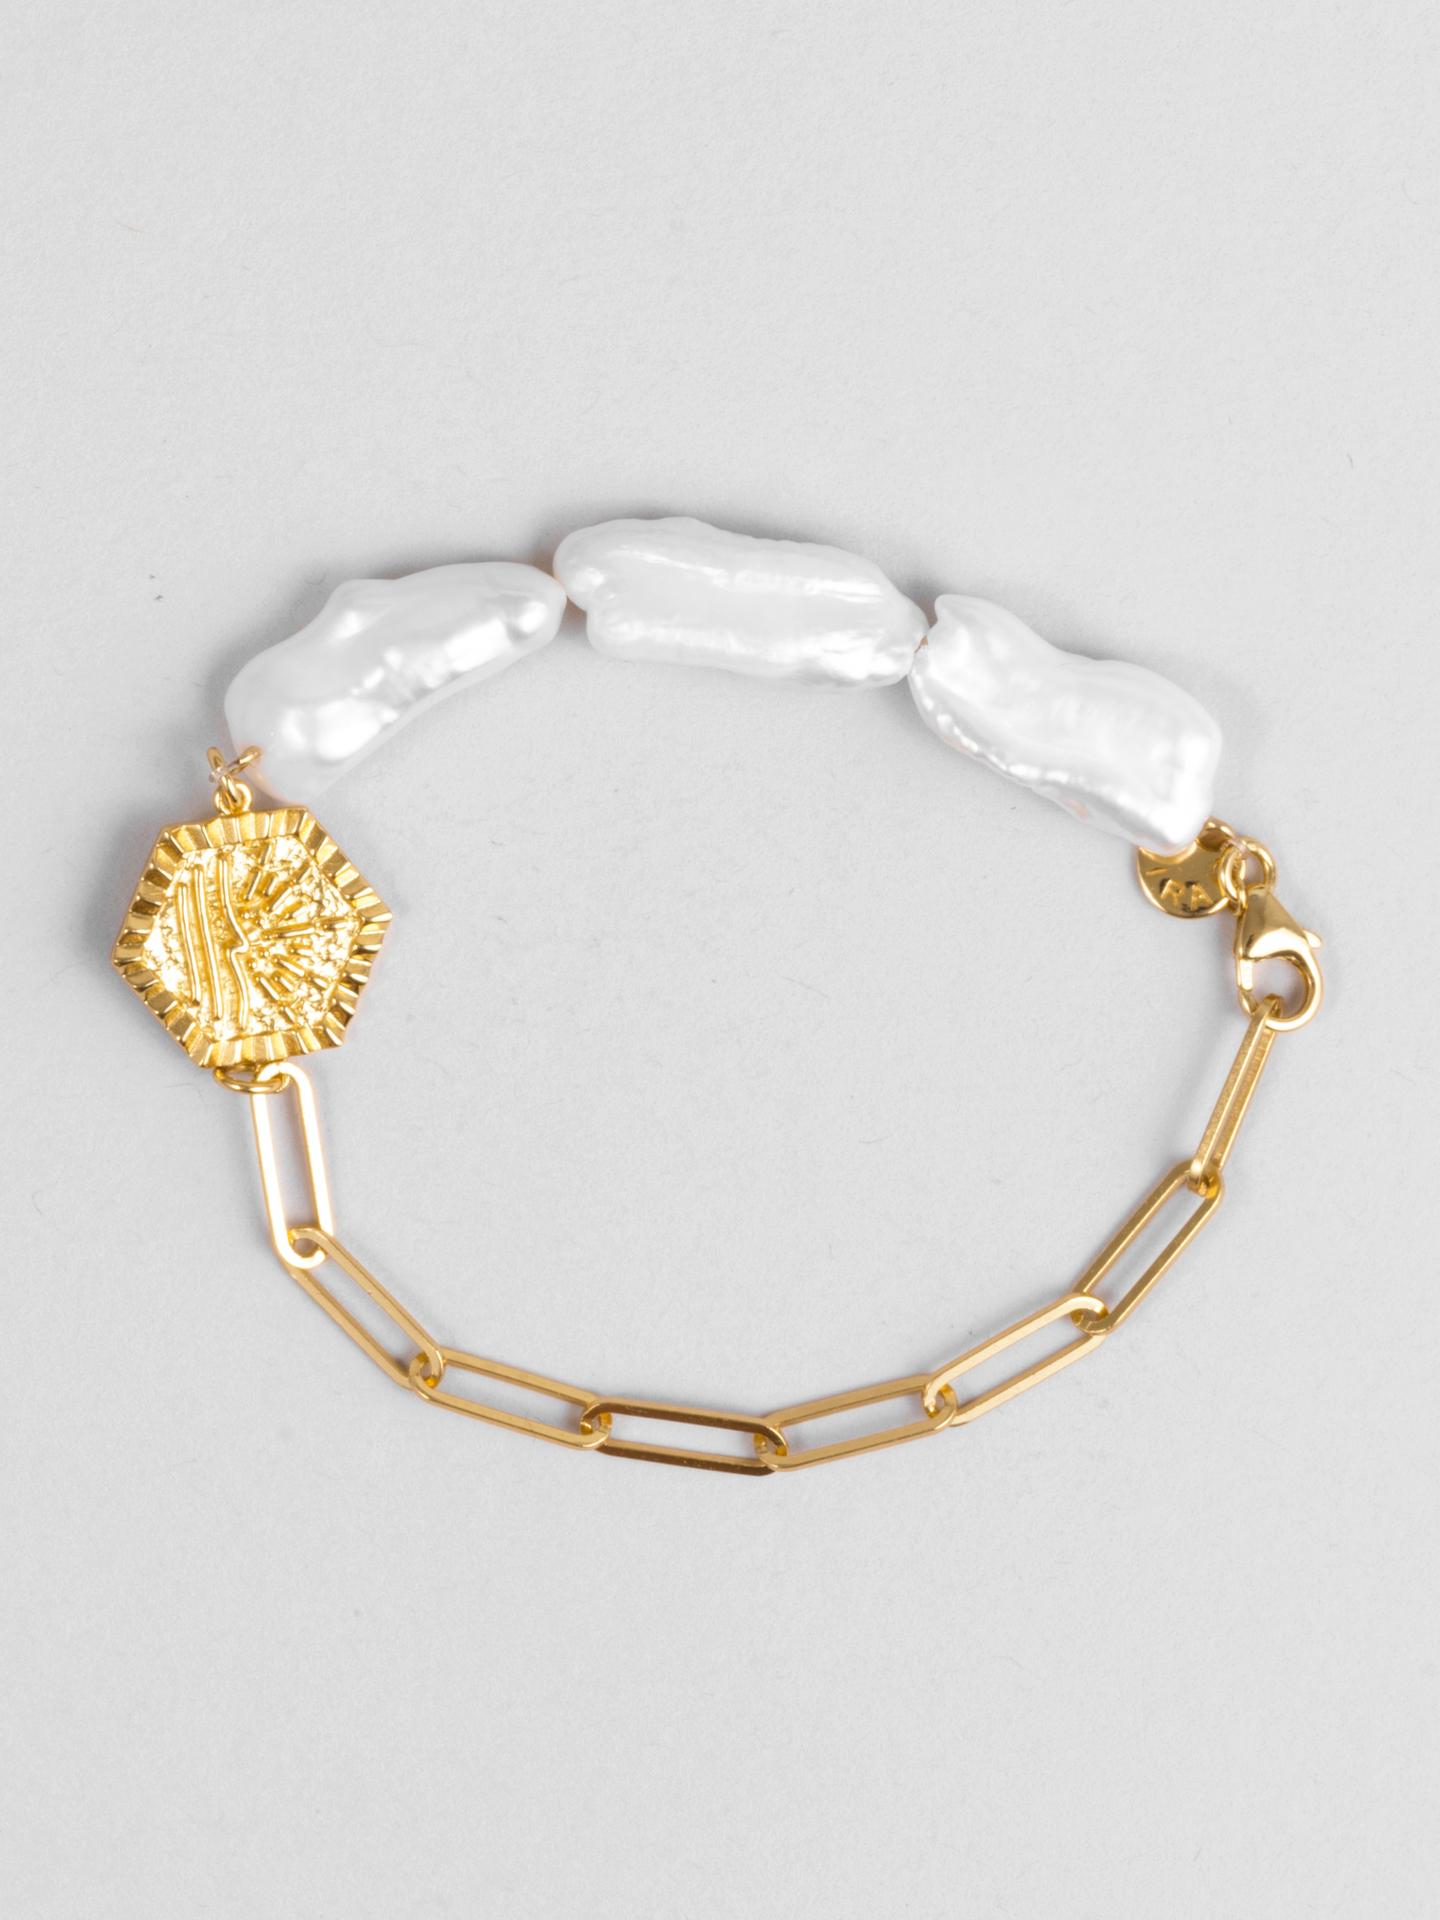 Fire and Desire Bracelet